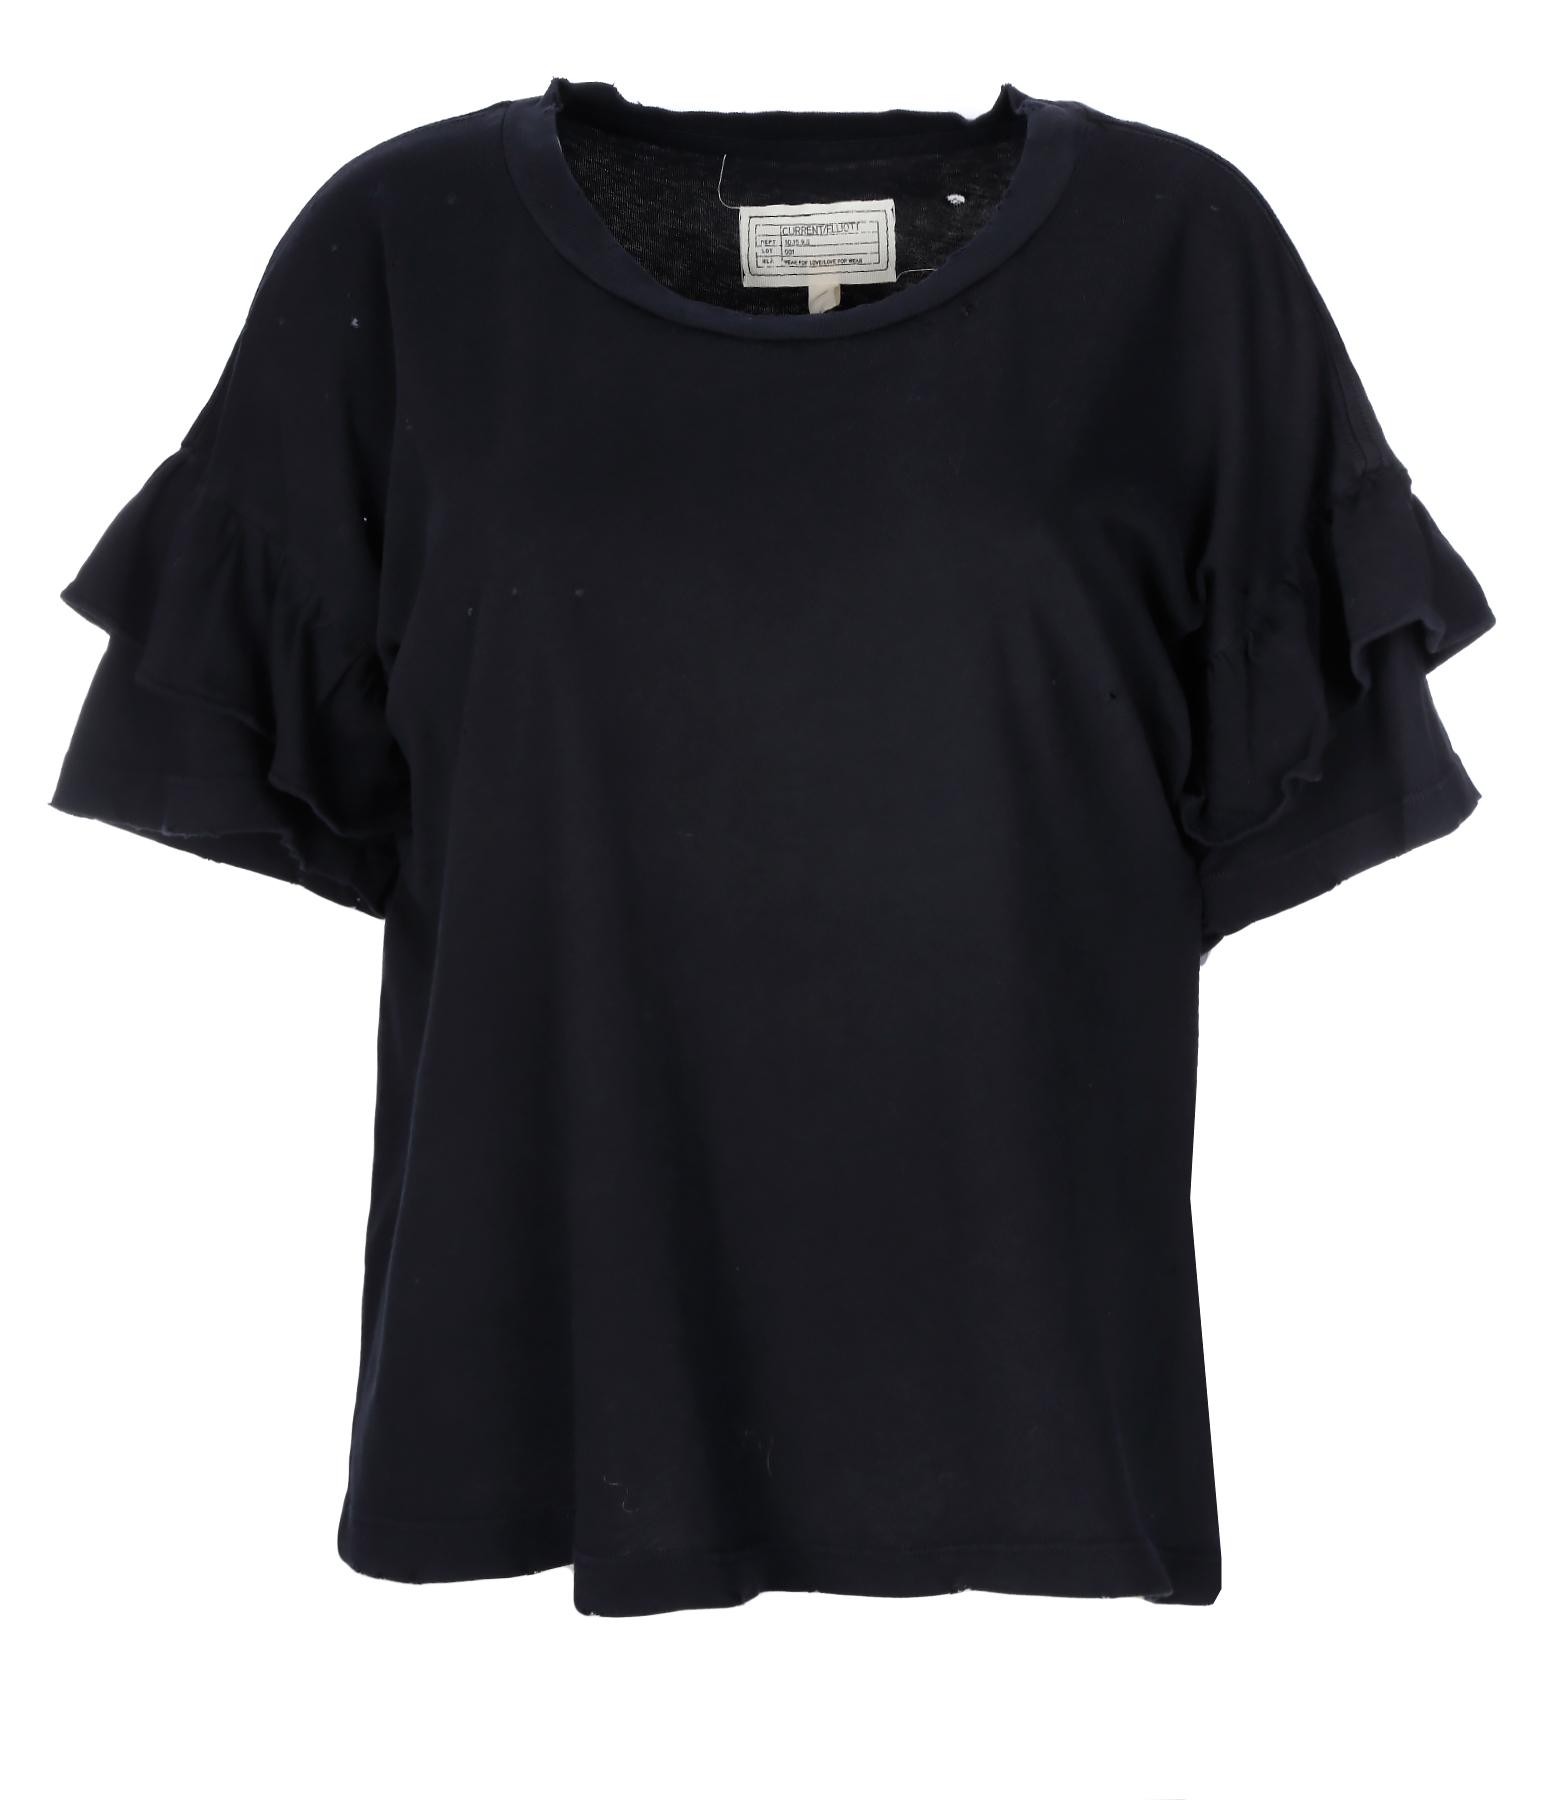 Tee-shirt The Ruffle Coton Washed Black